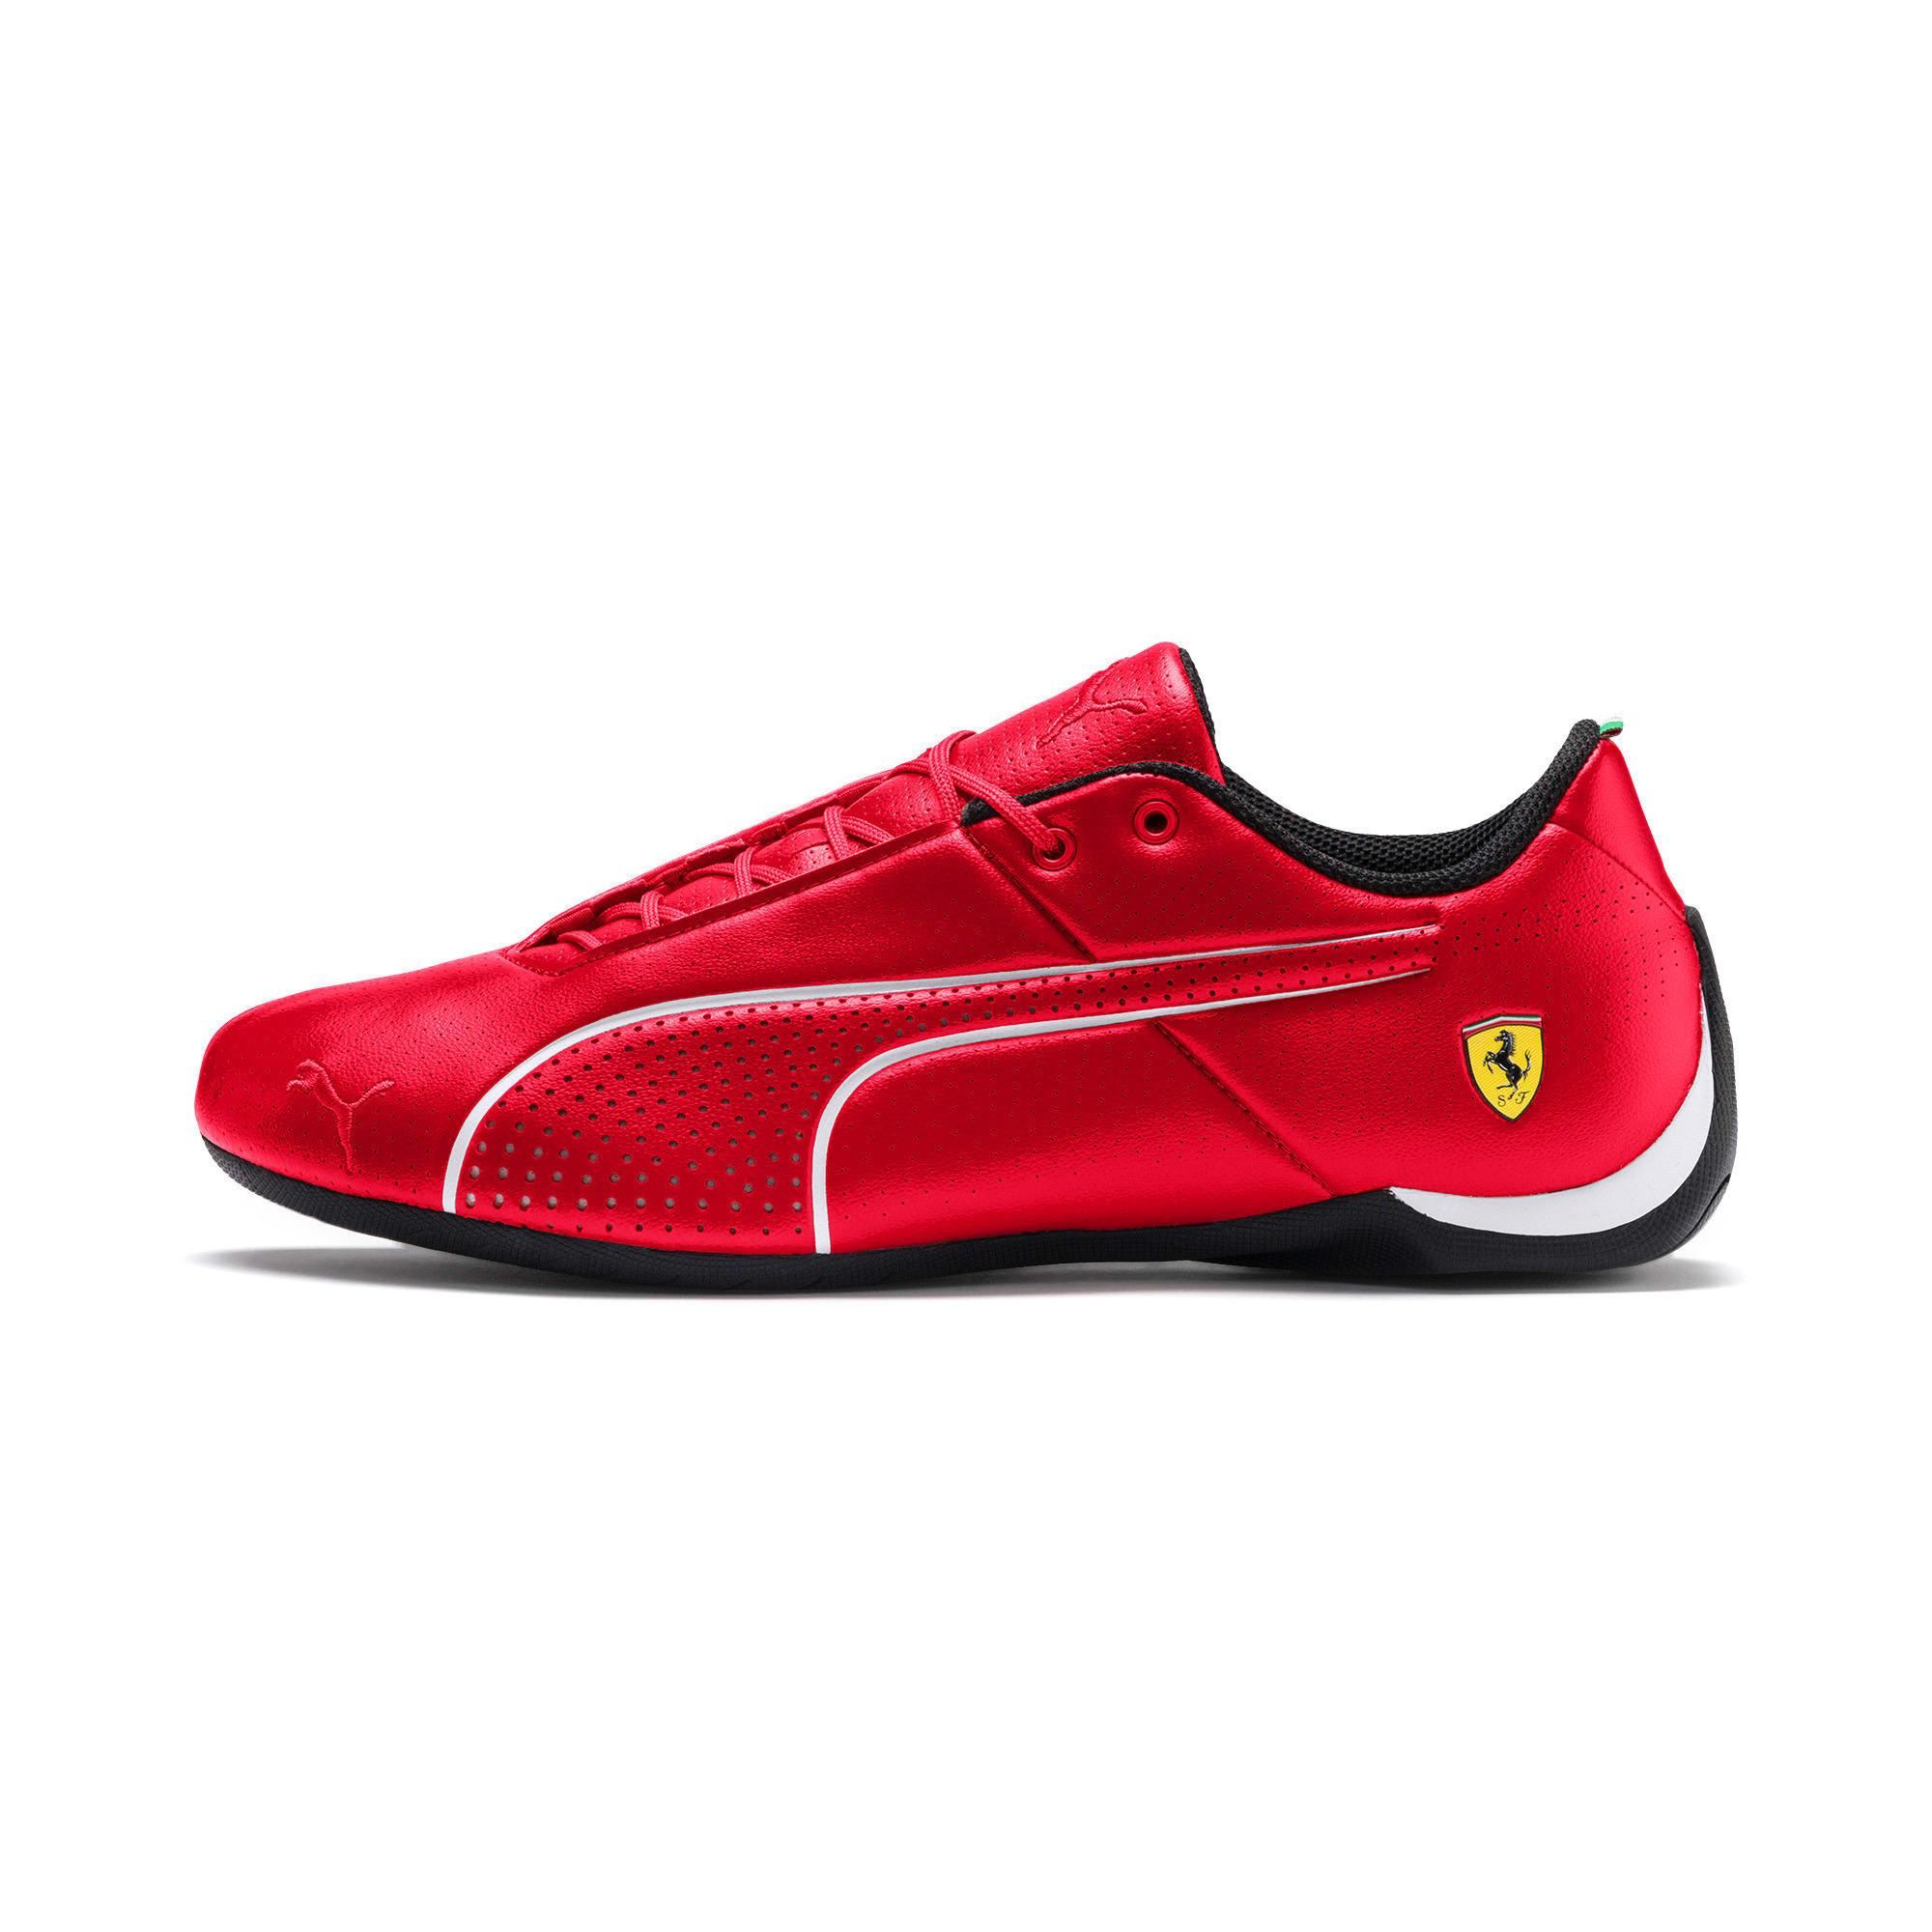 Thumbnail 1 of Scuderia Ferrari Future Cat Ultra Shoes, Rosso Corsa-Puma White, medium